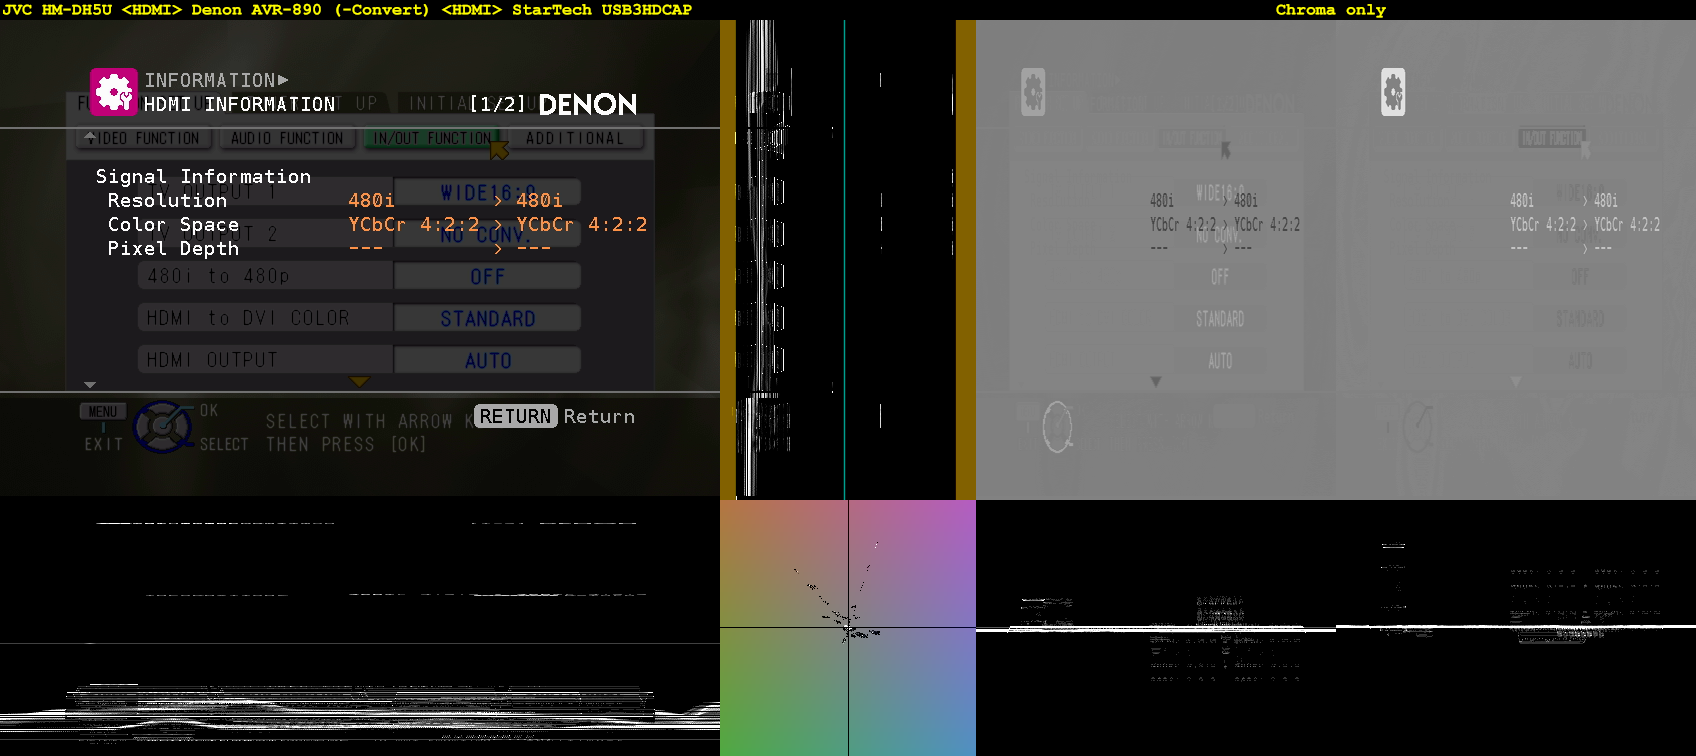 Click image for larger version  Name:Menu + Info - JVC HM-DH5U =HDMI= Denon AVR-890, -Convert =HDMI= StarTech USB3HDCAP.png Views:3230 Size:329.2 KB ID:35271